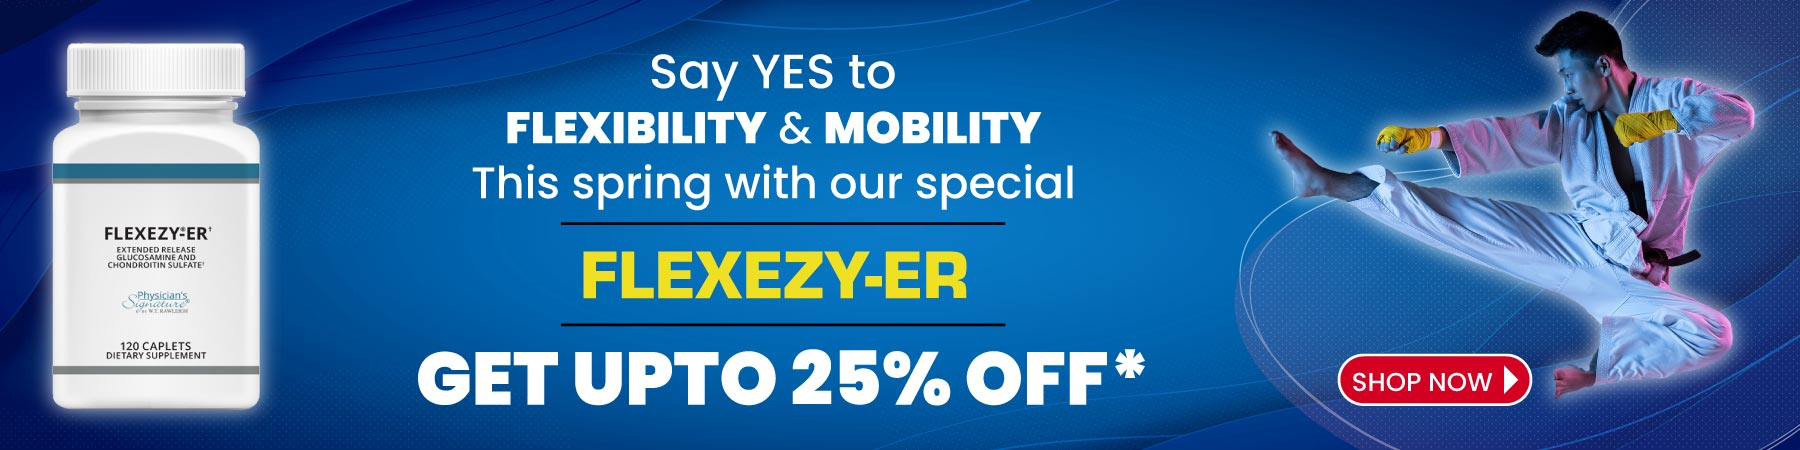 Flexezy-ER 25% off